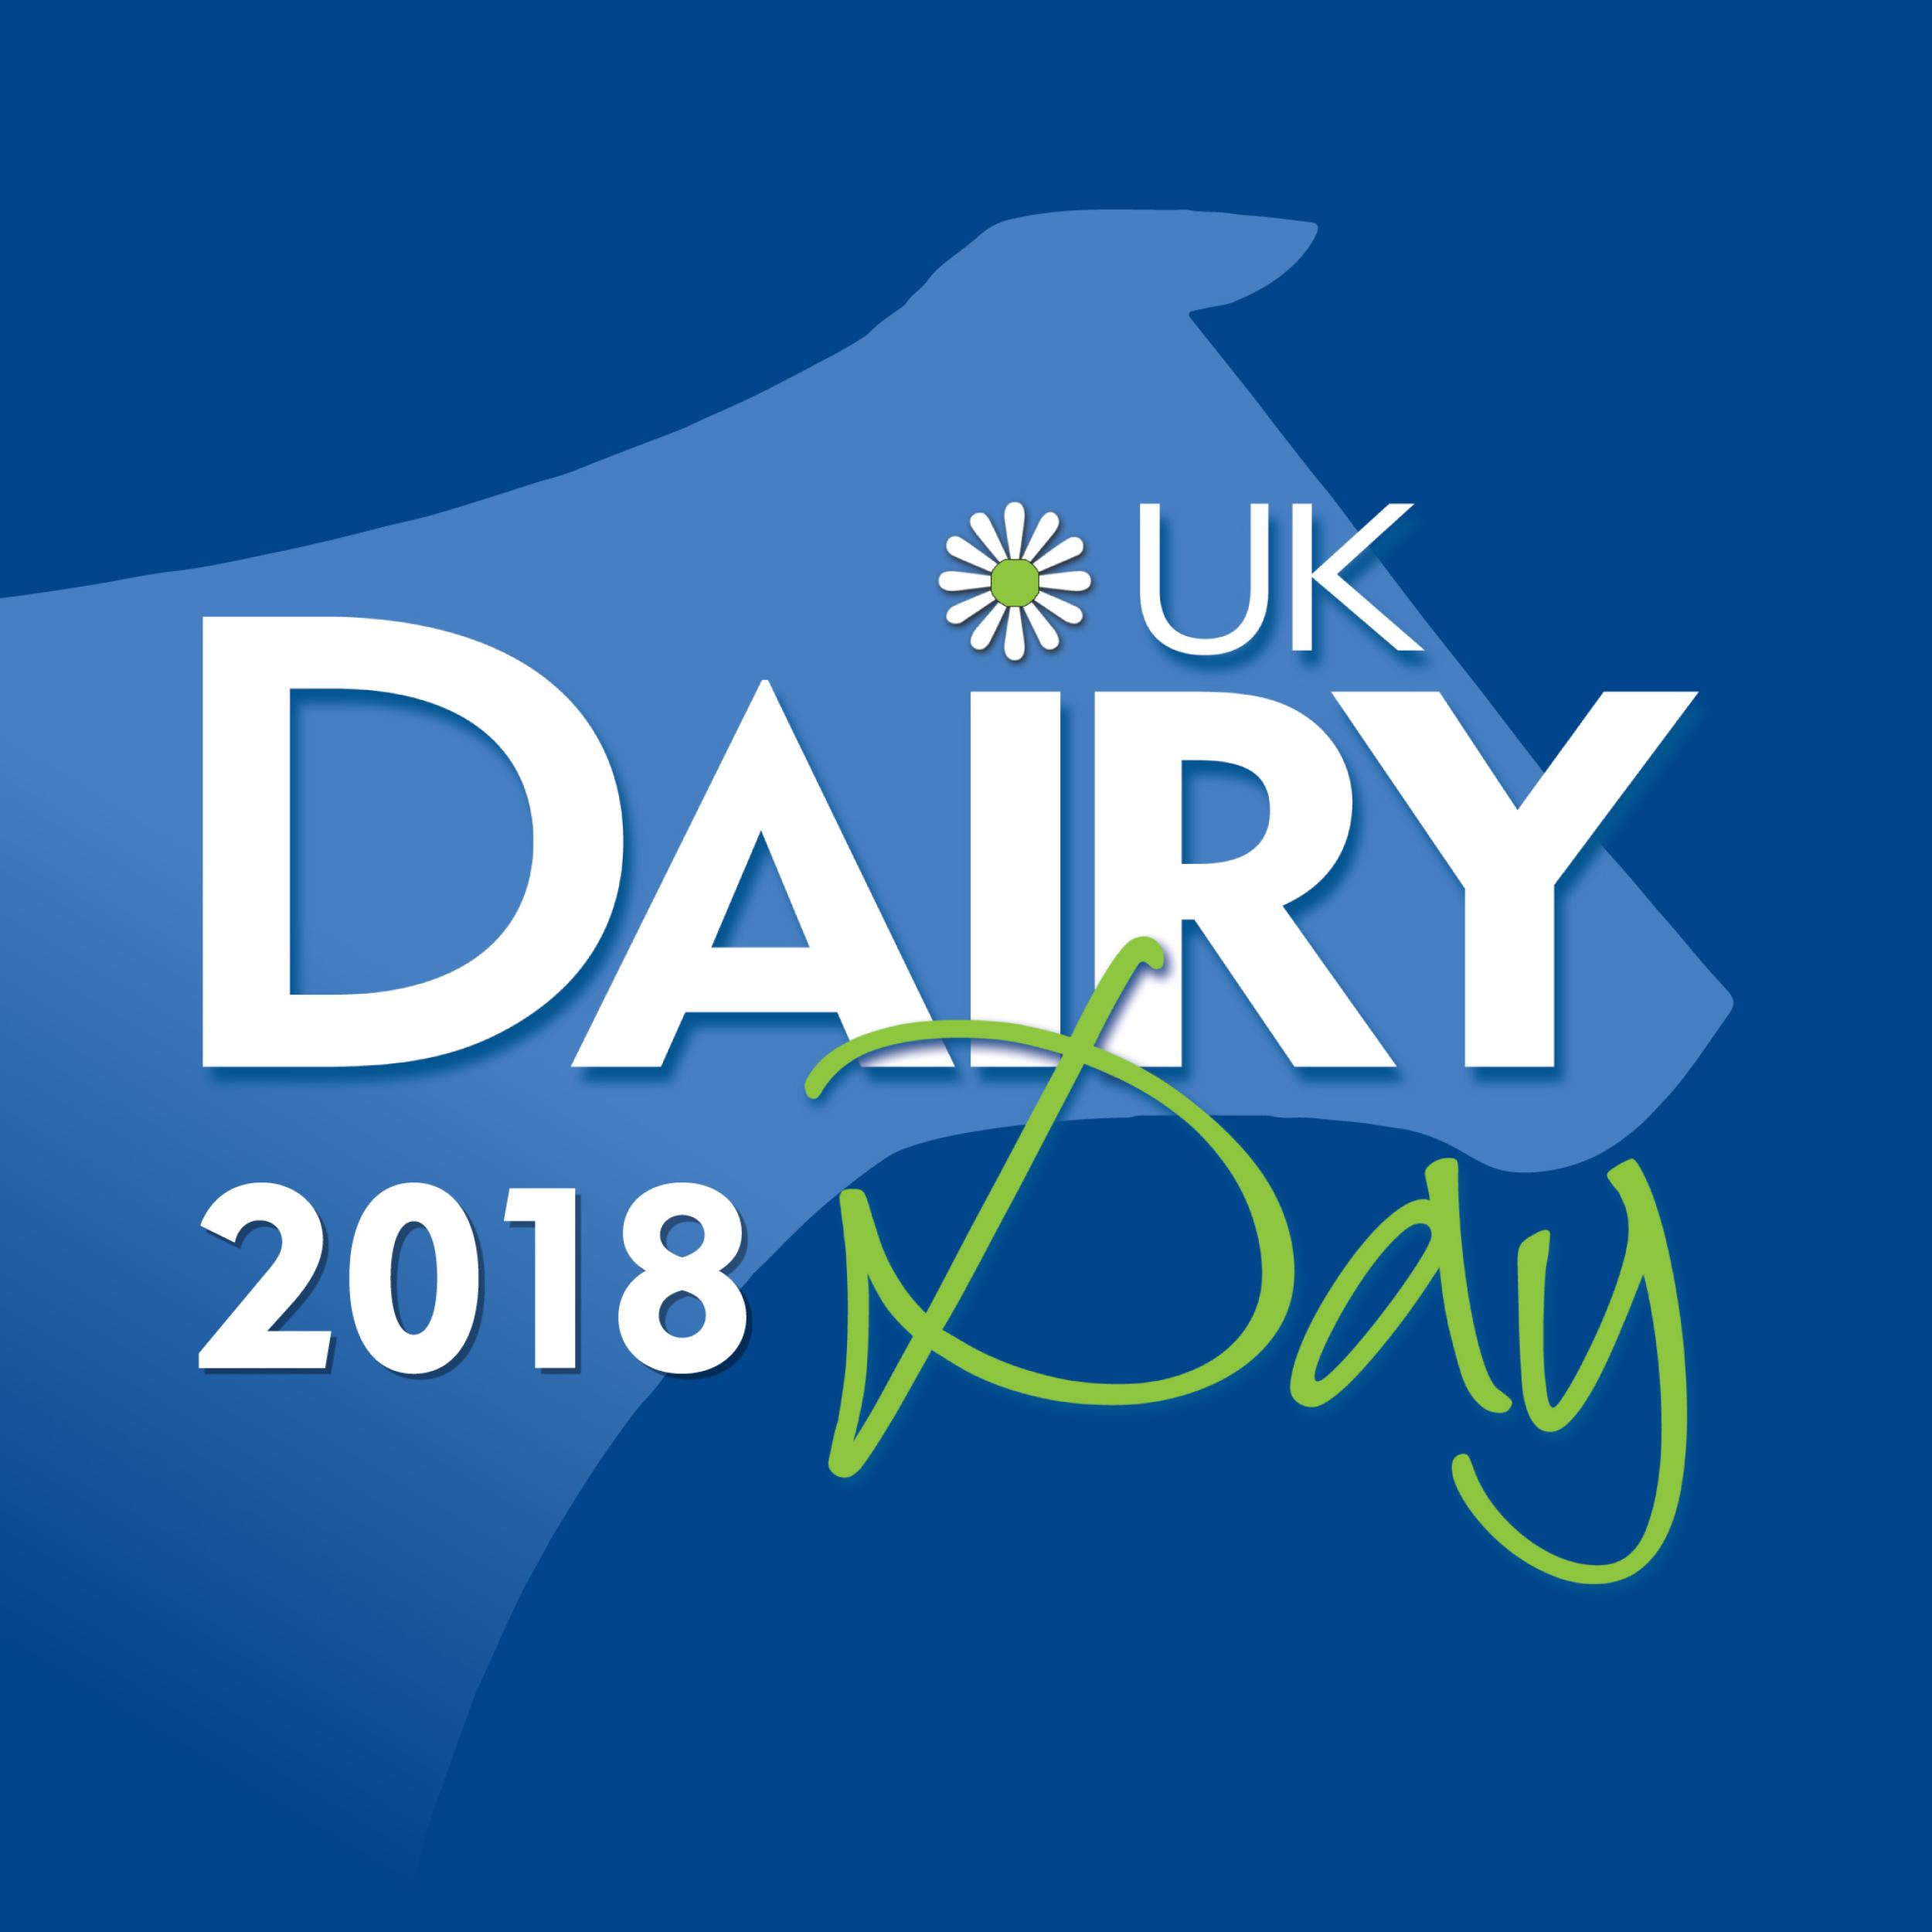 UK Dairy Day 2018